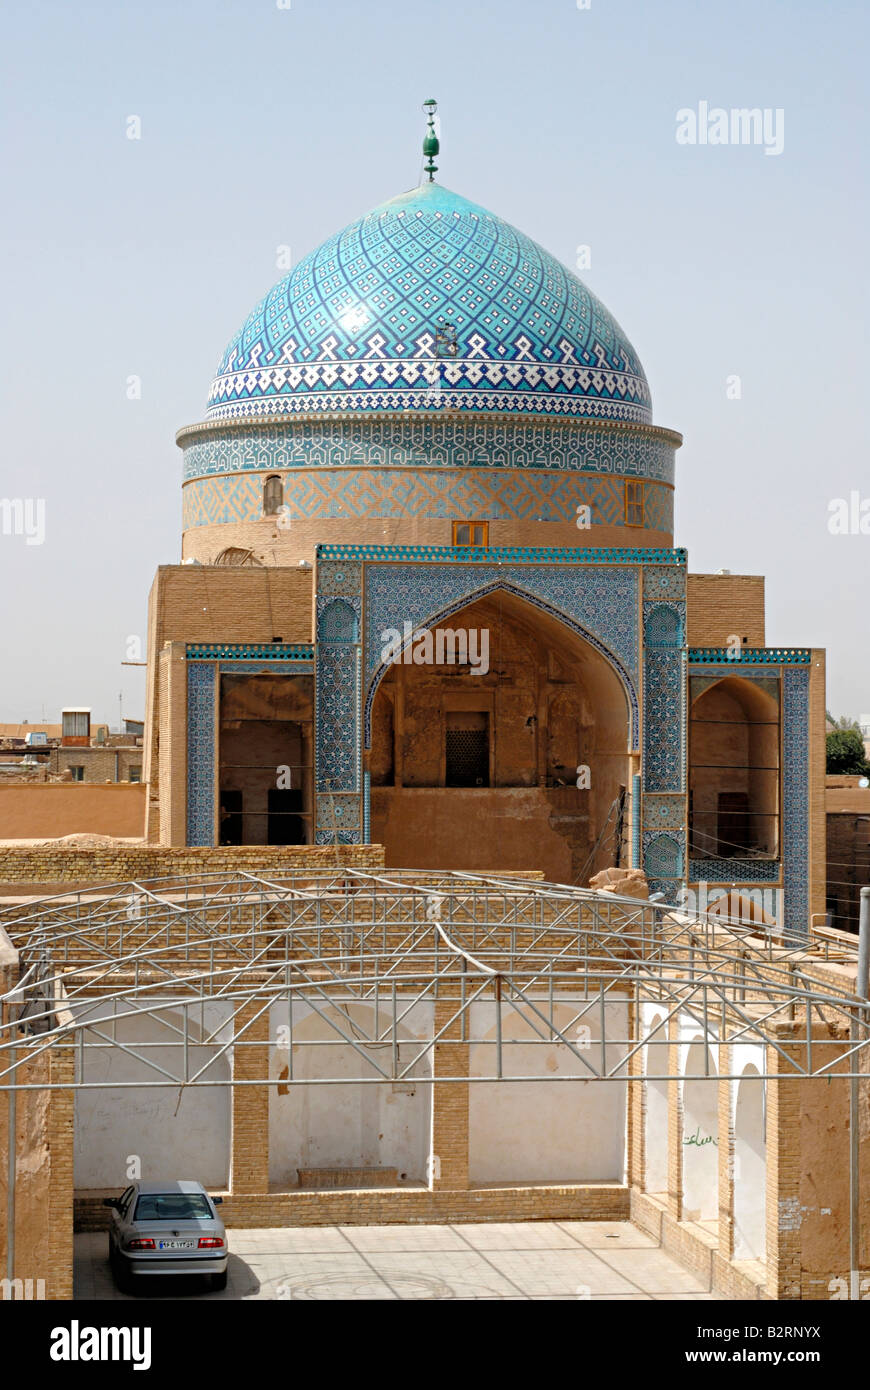 Iran Yazd- General View of Mausoleum of Sayyed Rokn Al-Din - Stock Image